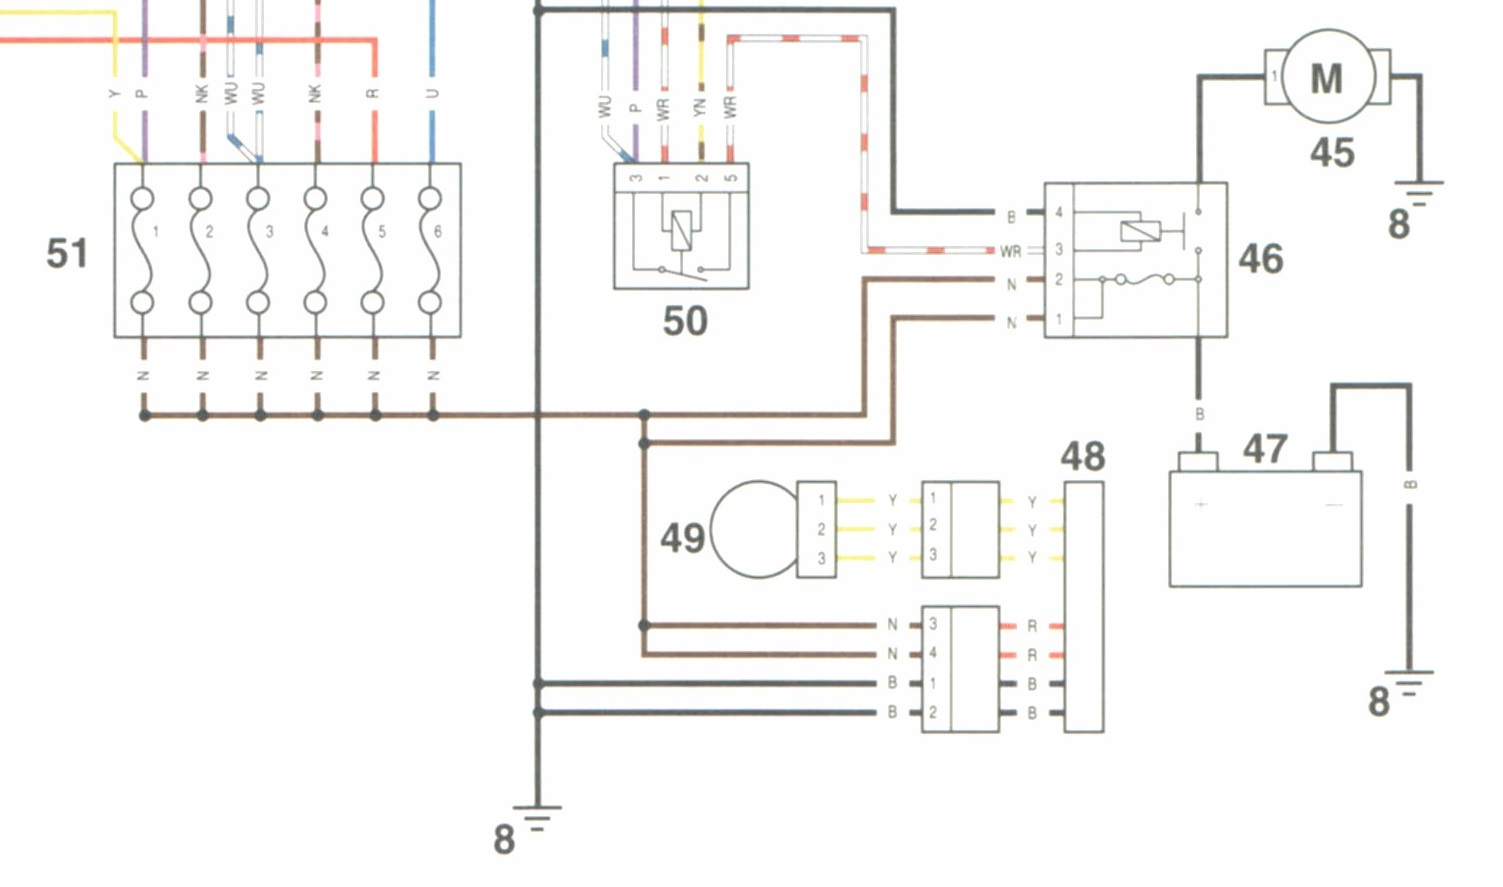 Wiring Diagram For Triumph Daytona